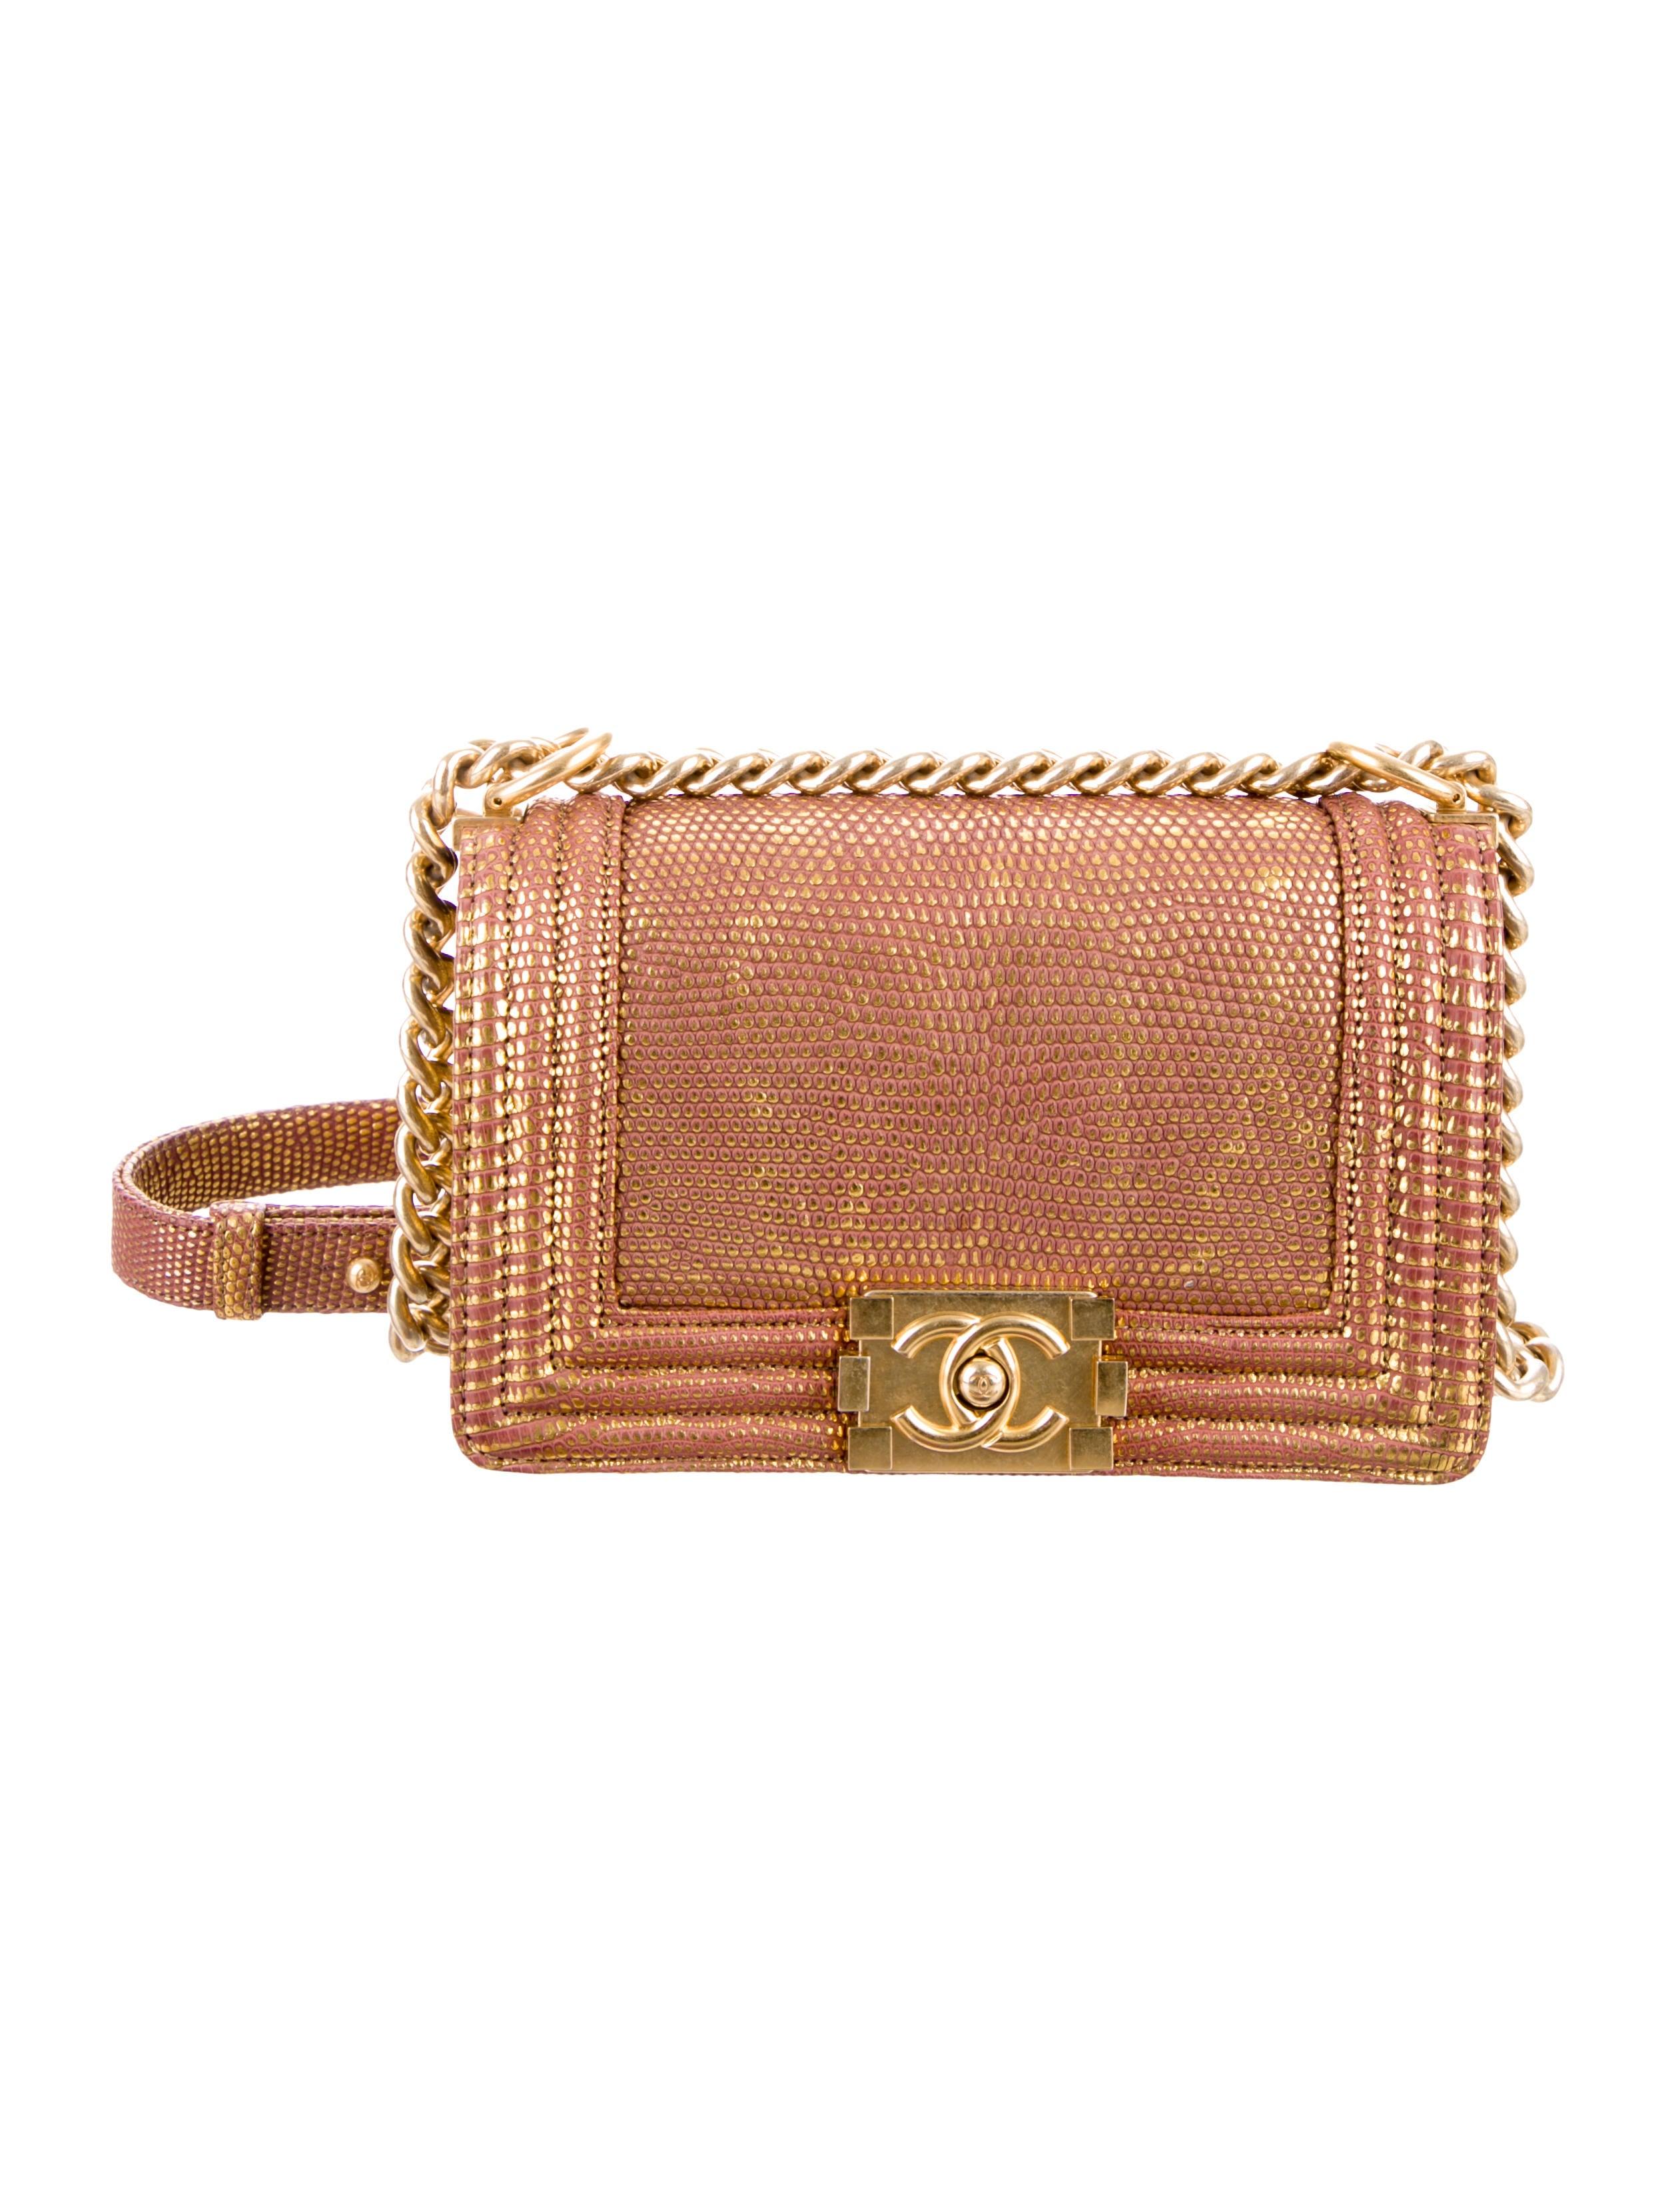 Chanel Small Lizard Boy Bag Handbags Cha91981 The